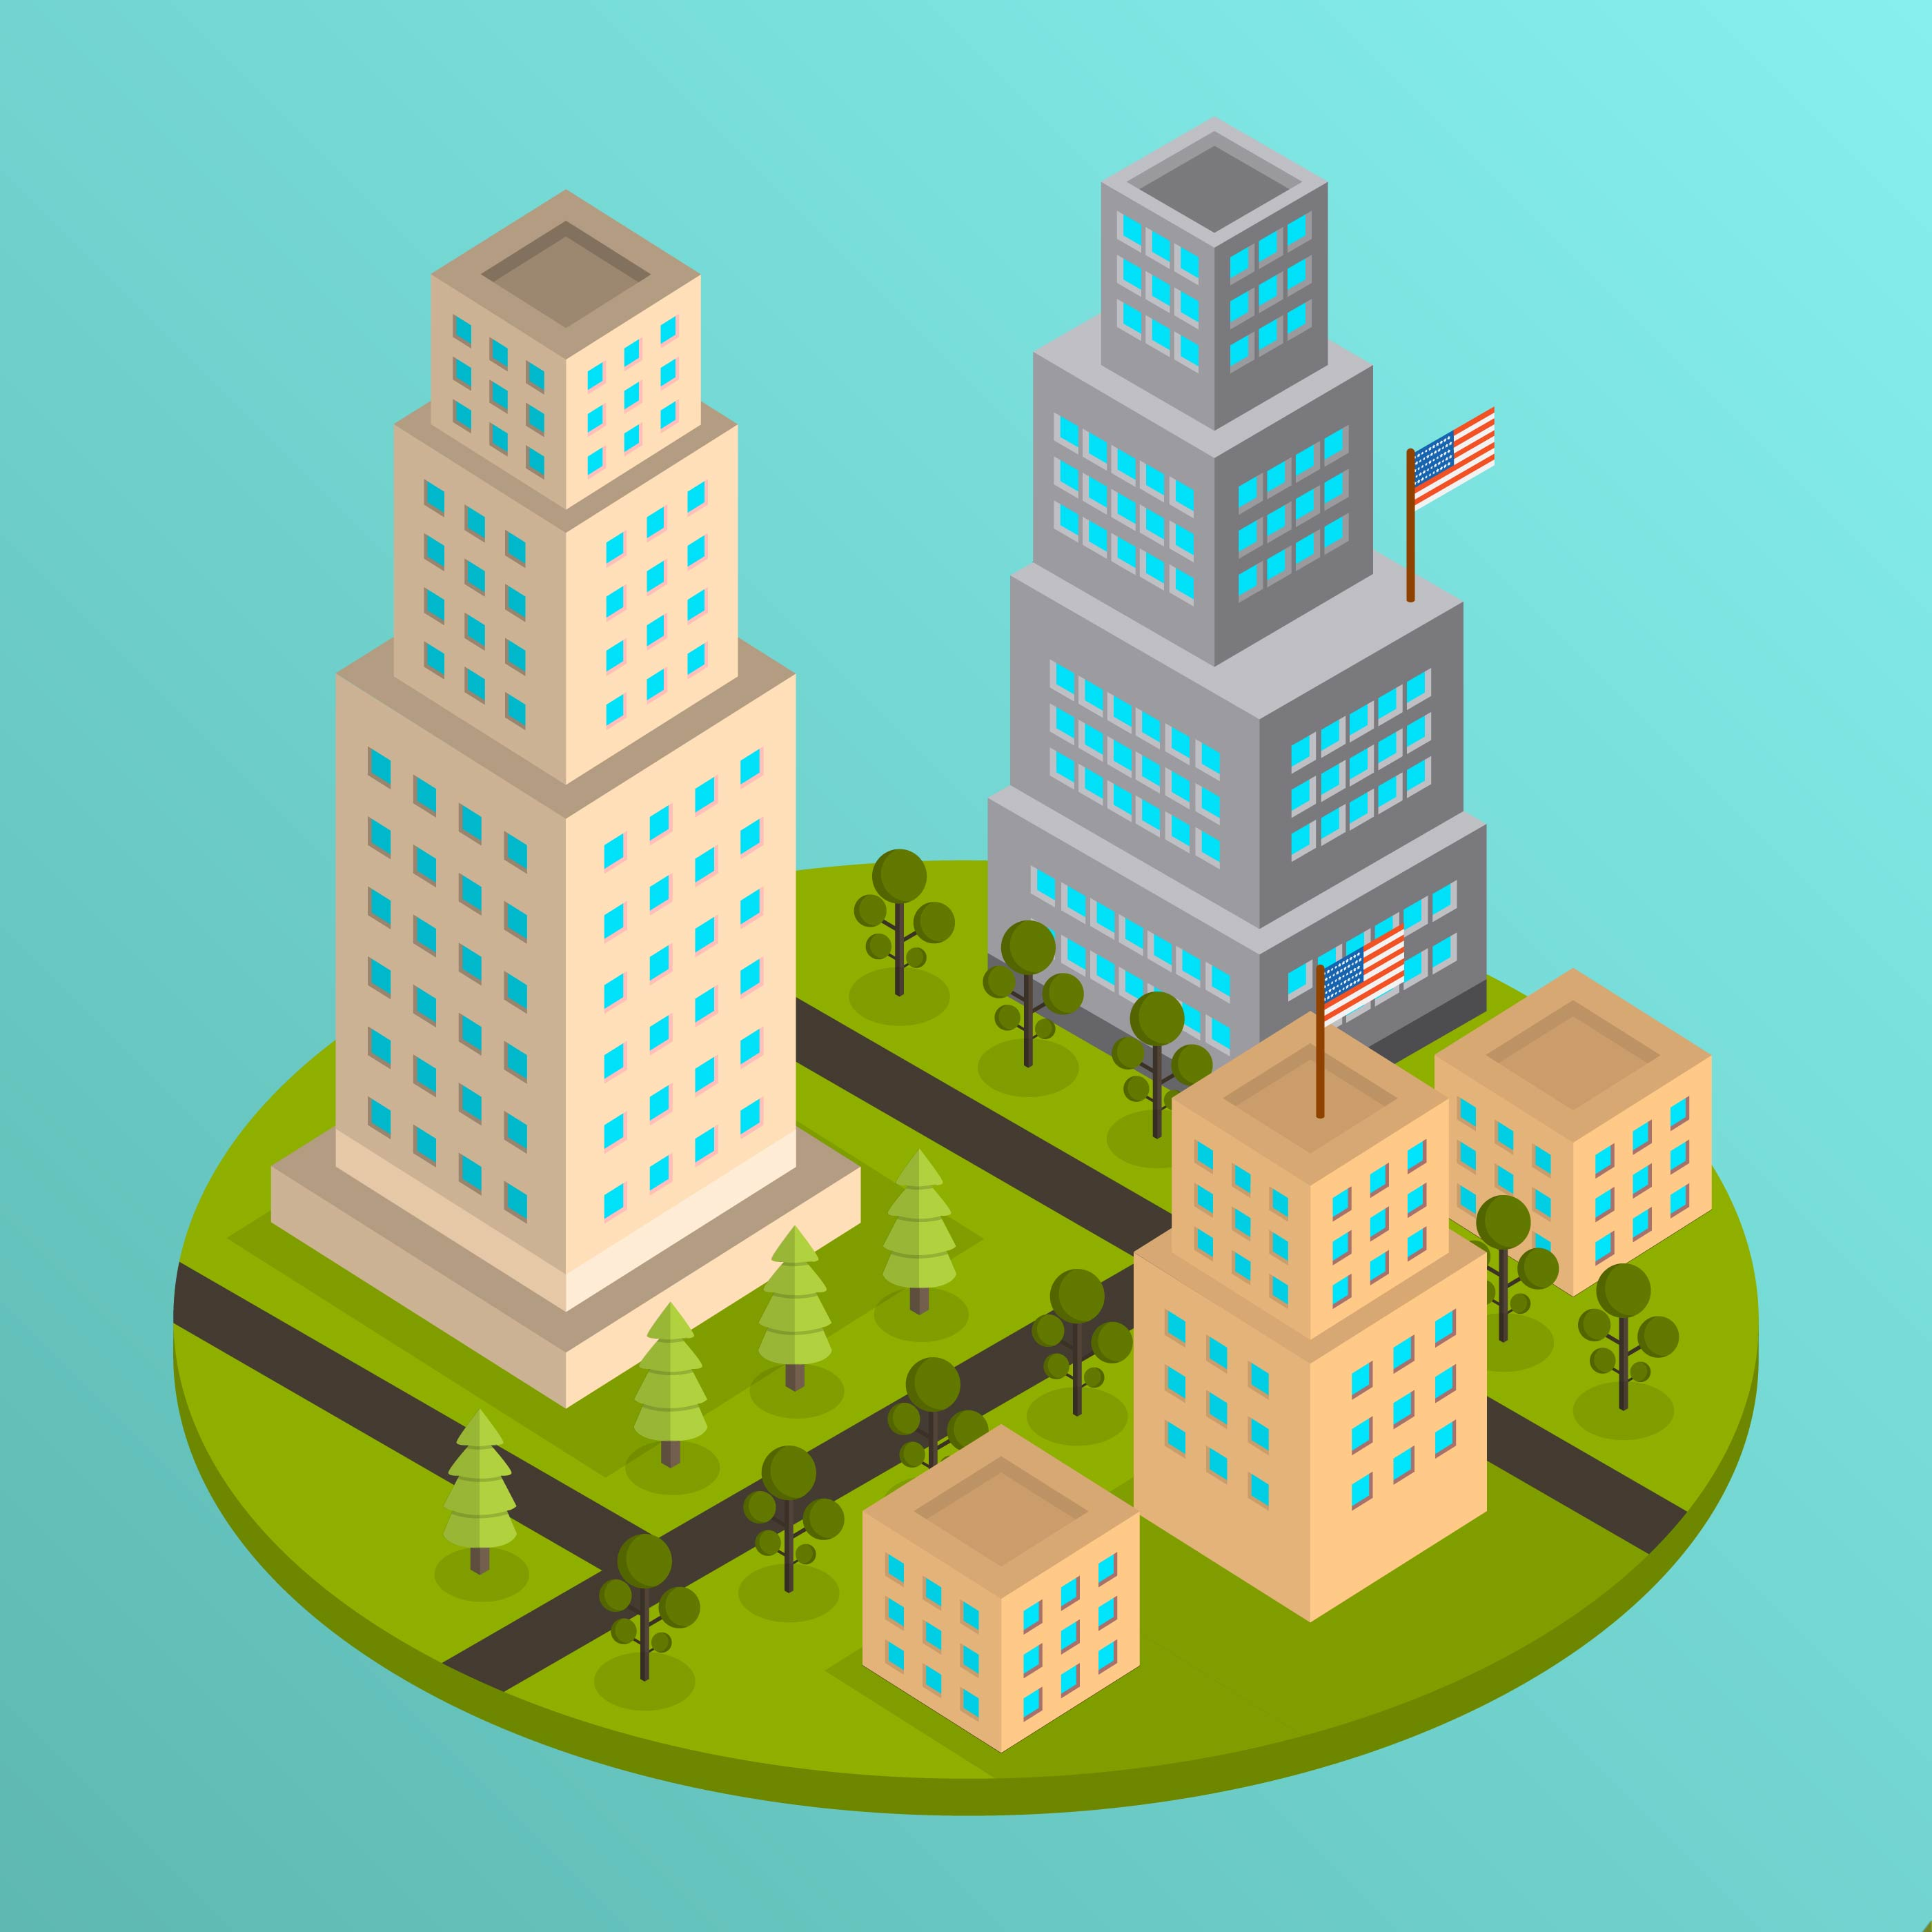 Flat Nyc: Flat Isometric NYC Vector Illustration